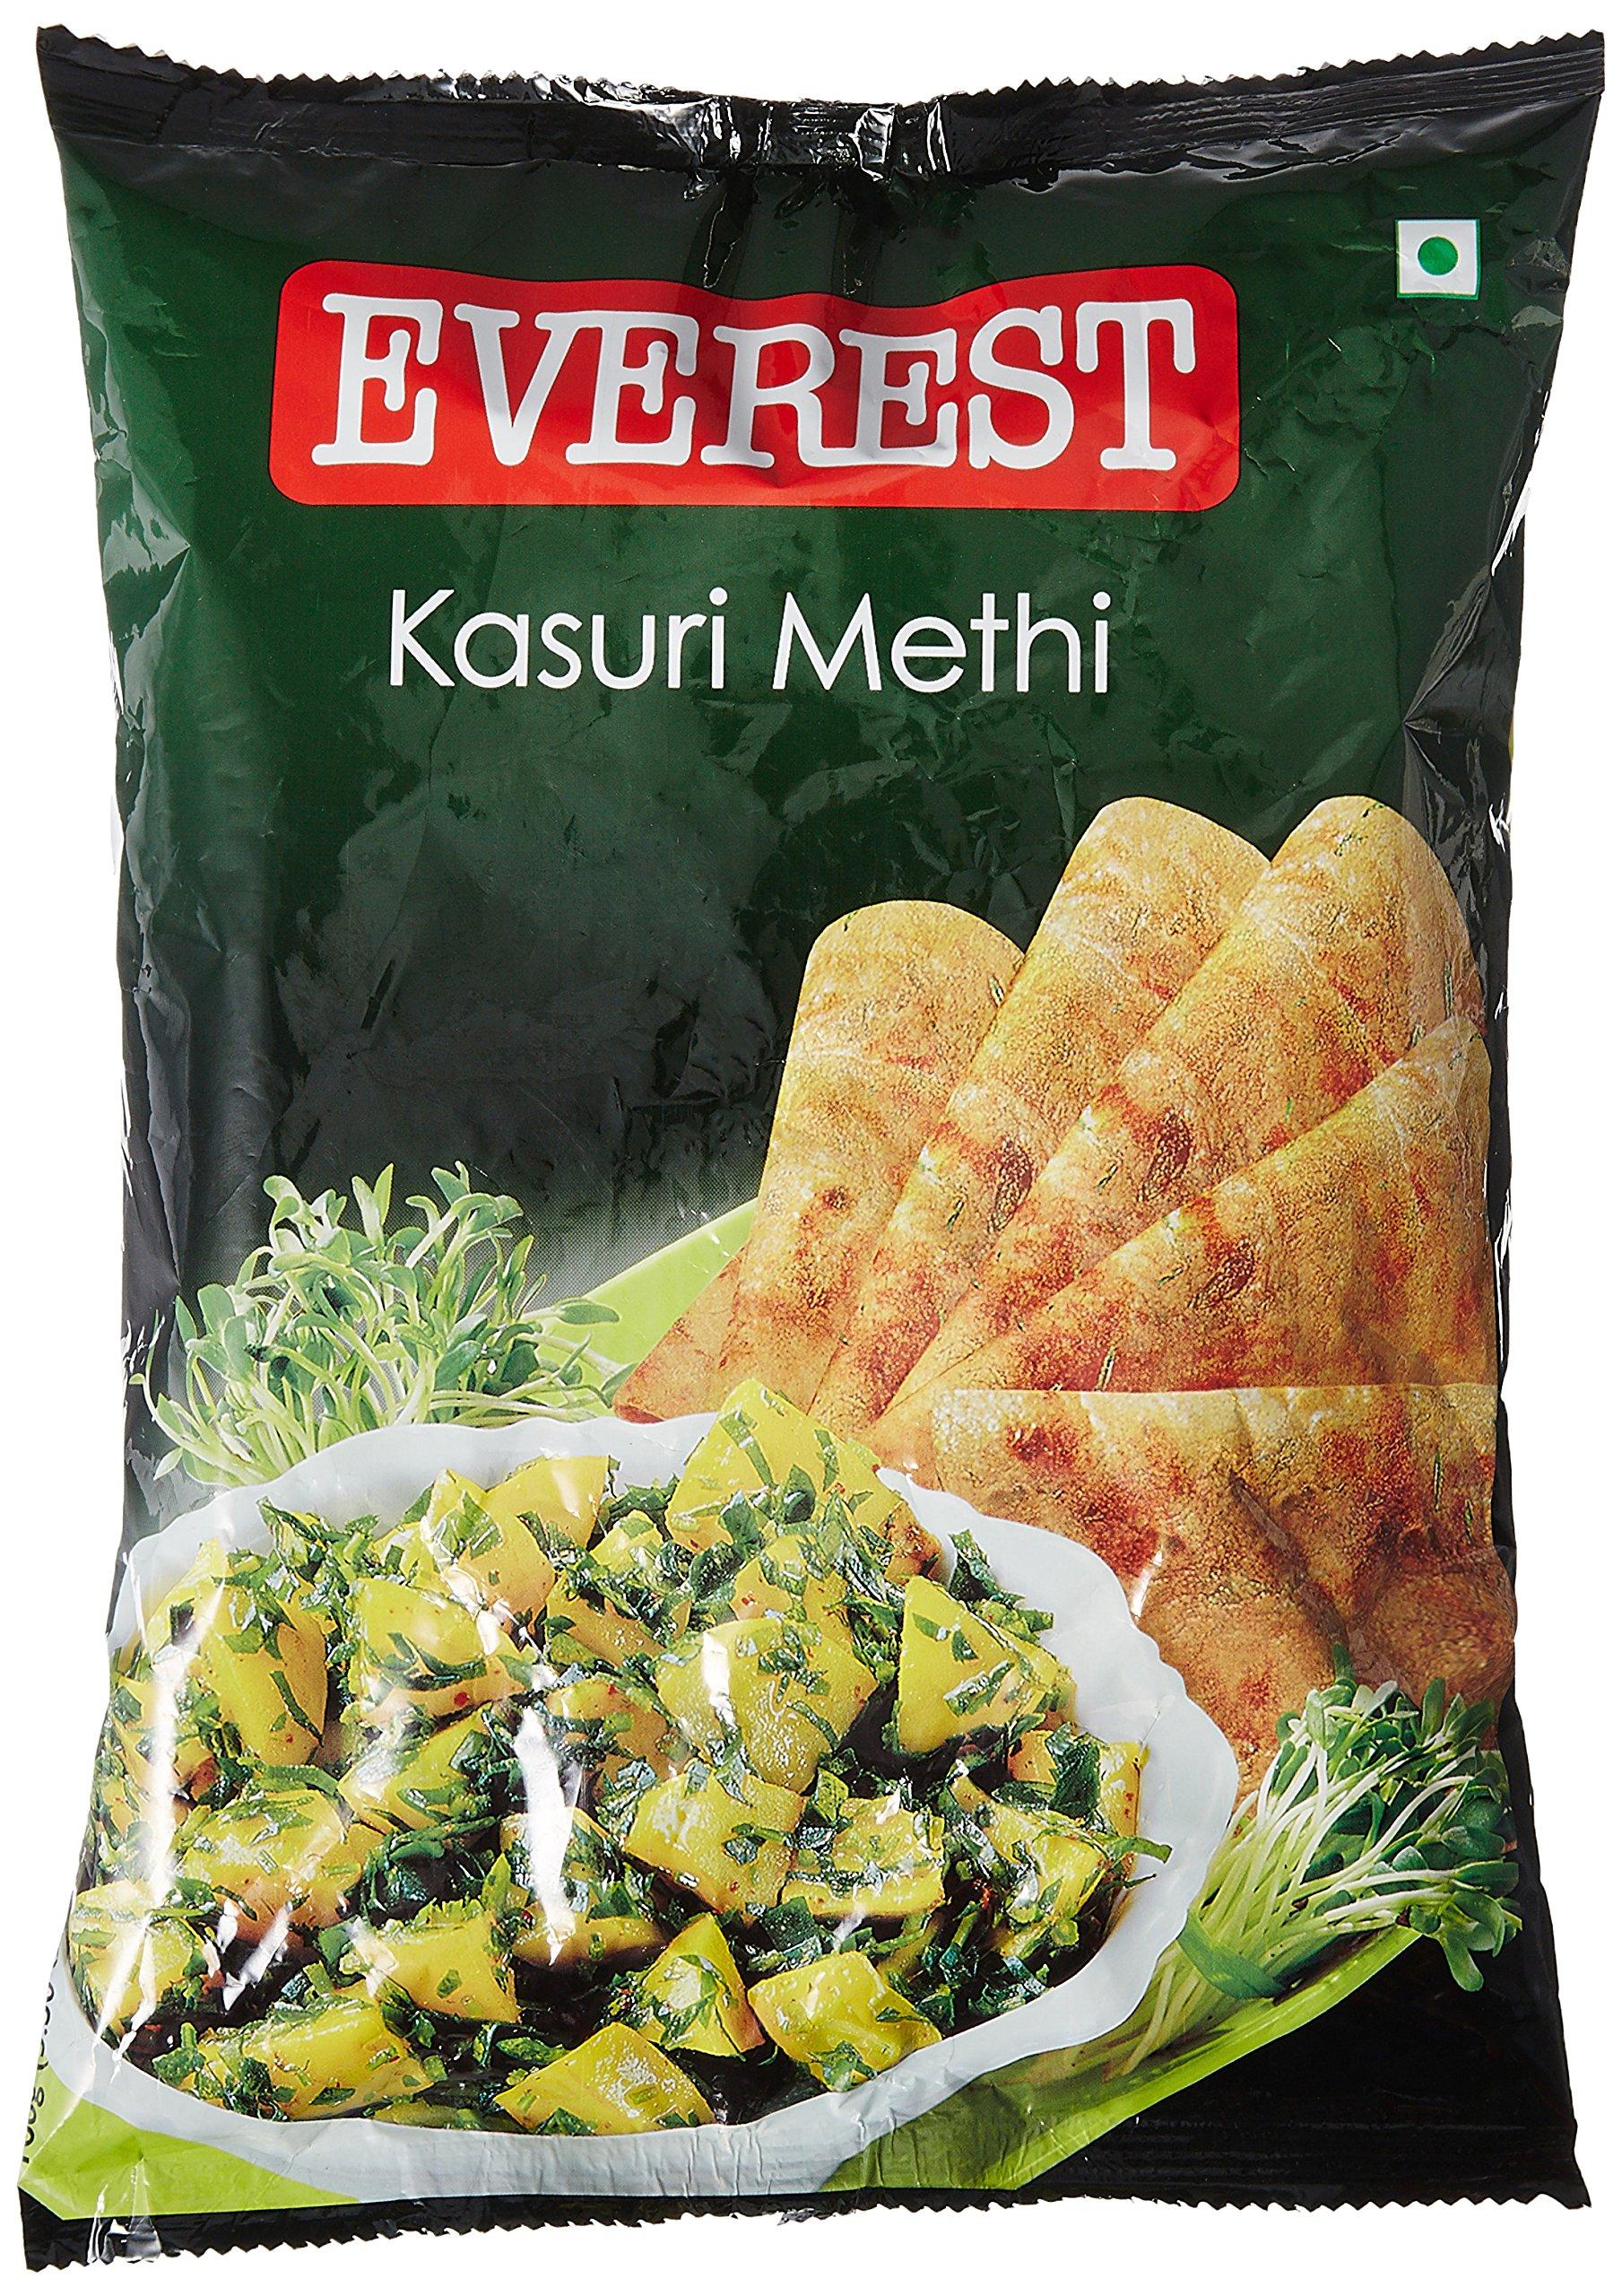 Amazon Com Everest Kasuri Methi 100 Grams Pouch 3 5 Oz India Kasuri Methi Leaves Grocery Gourmet Food